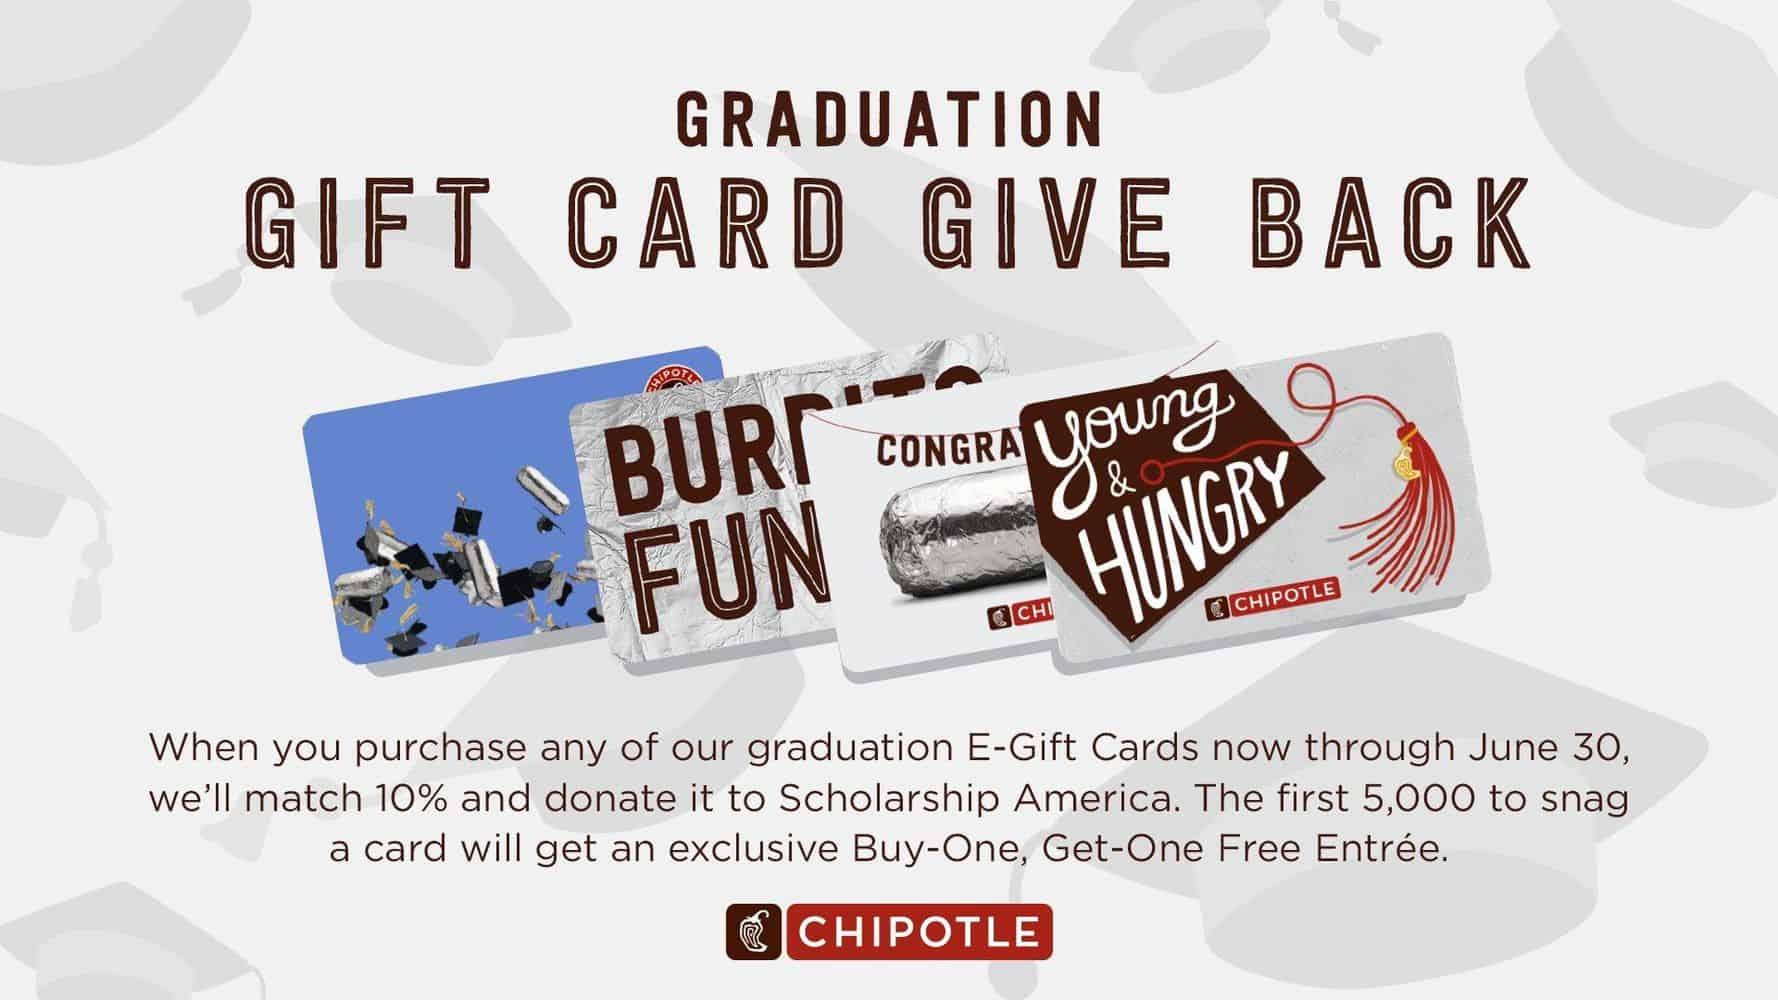 Chipotle-Launches-New-Egift-Card-Program-To-Celebrate-2020-Graduates-via-downriver-restaurants